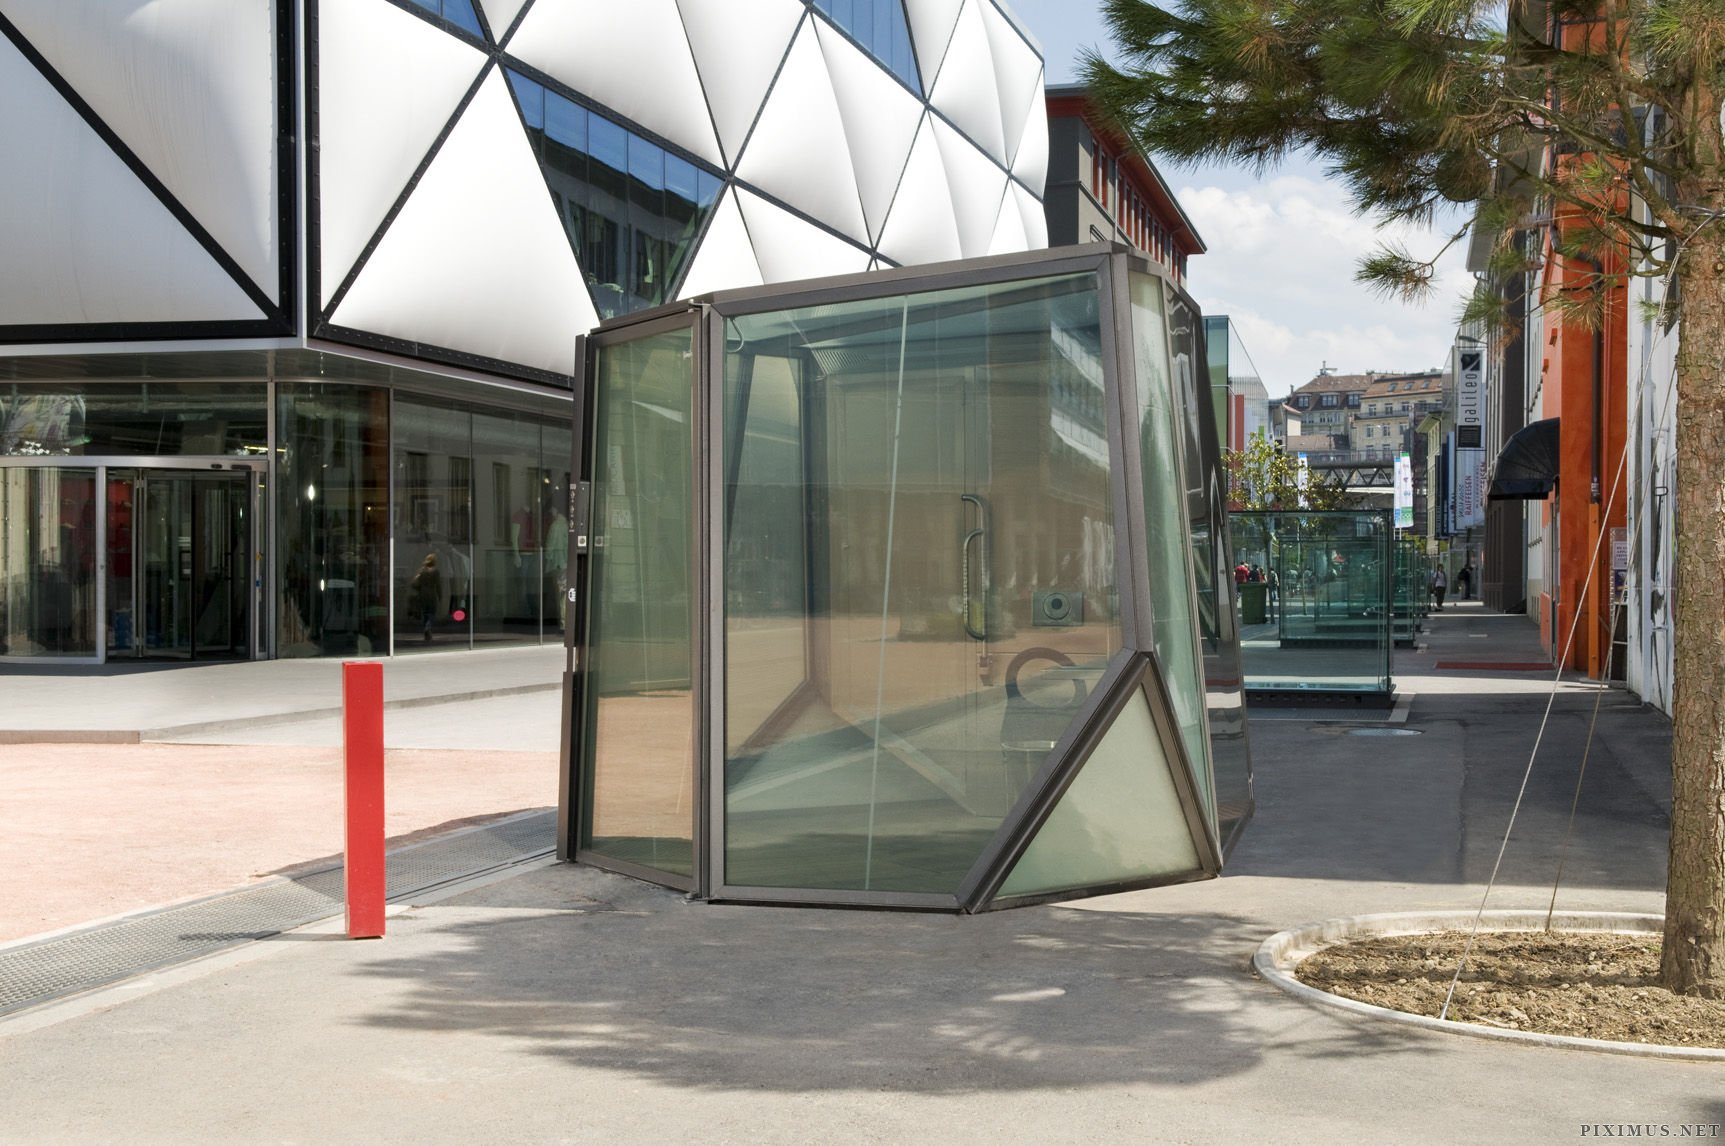 Swiss Public Bathroom with Transparent Walls